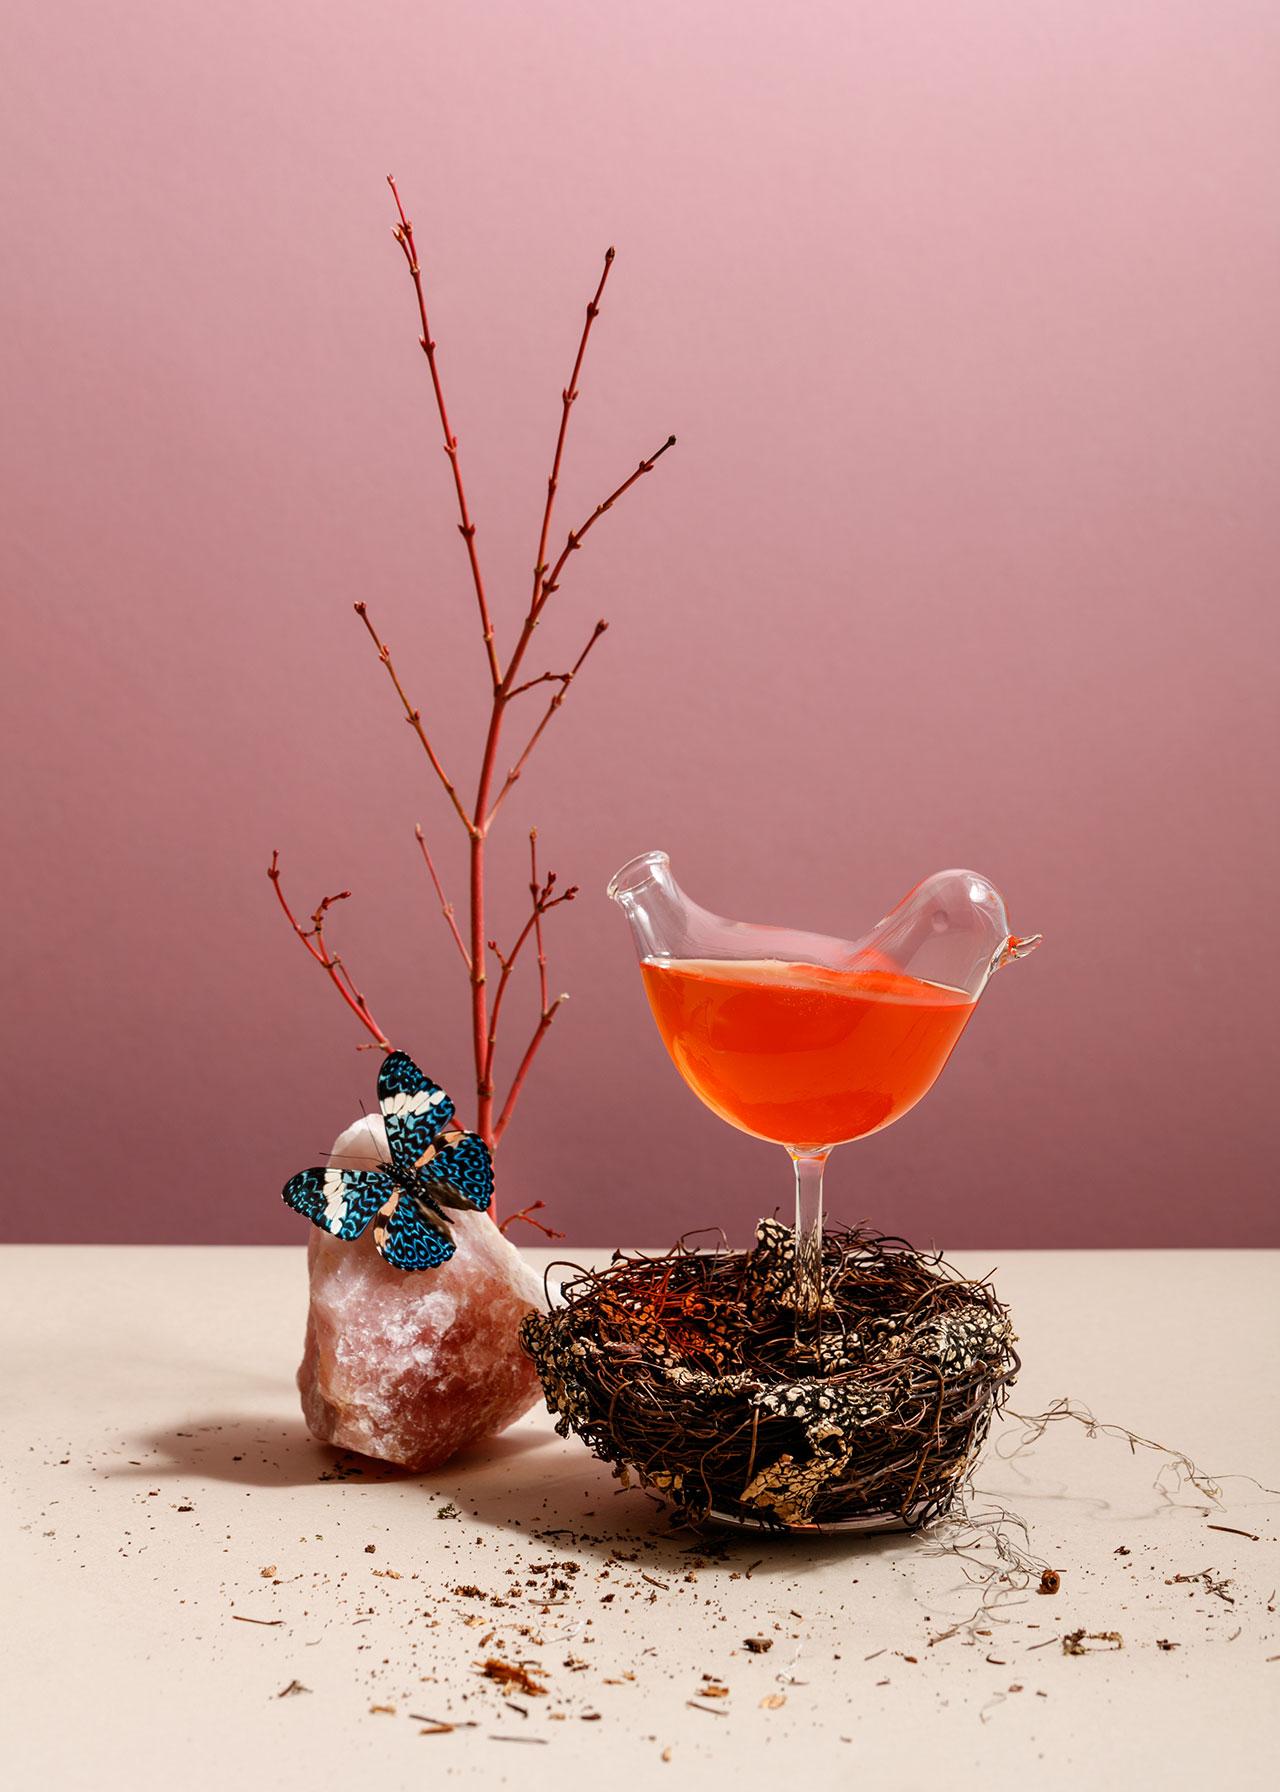 A Mid-Century Modern Restaurant with A Botanical Inspiration 6